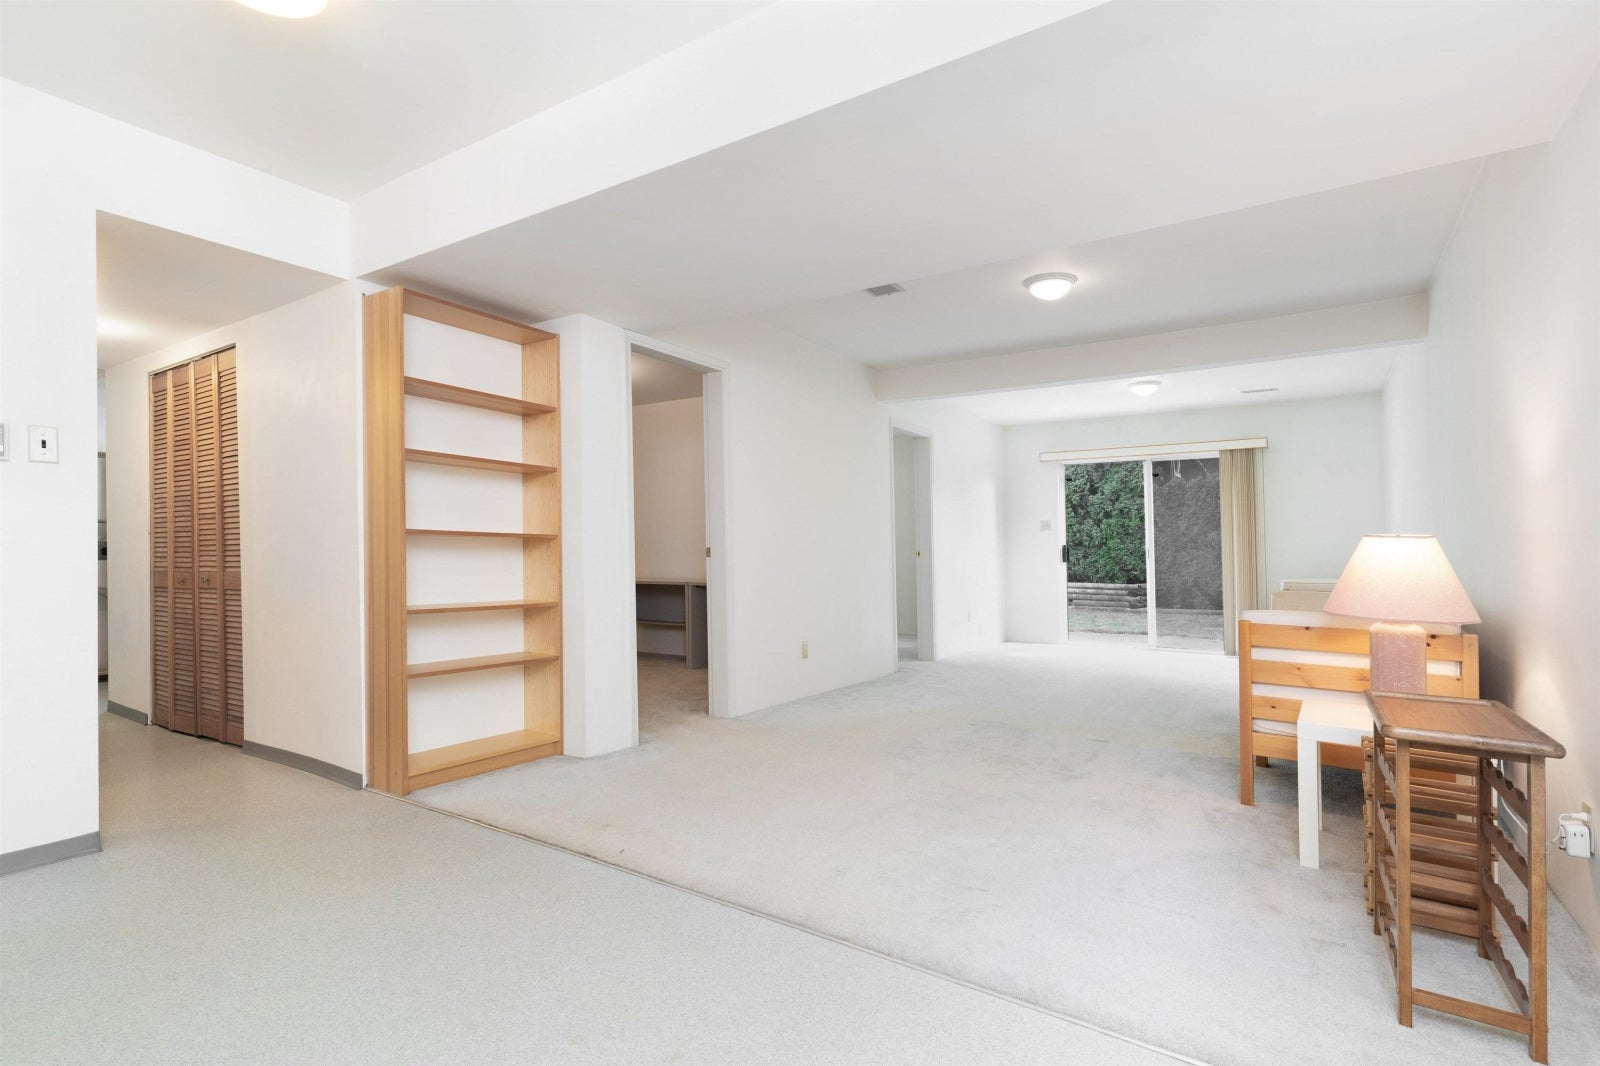 2556 RAVEN COURT - Eagle Ridge CQ House/Single Family for sale, 4 Bedrooms (R2611826) #27